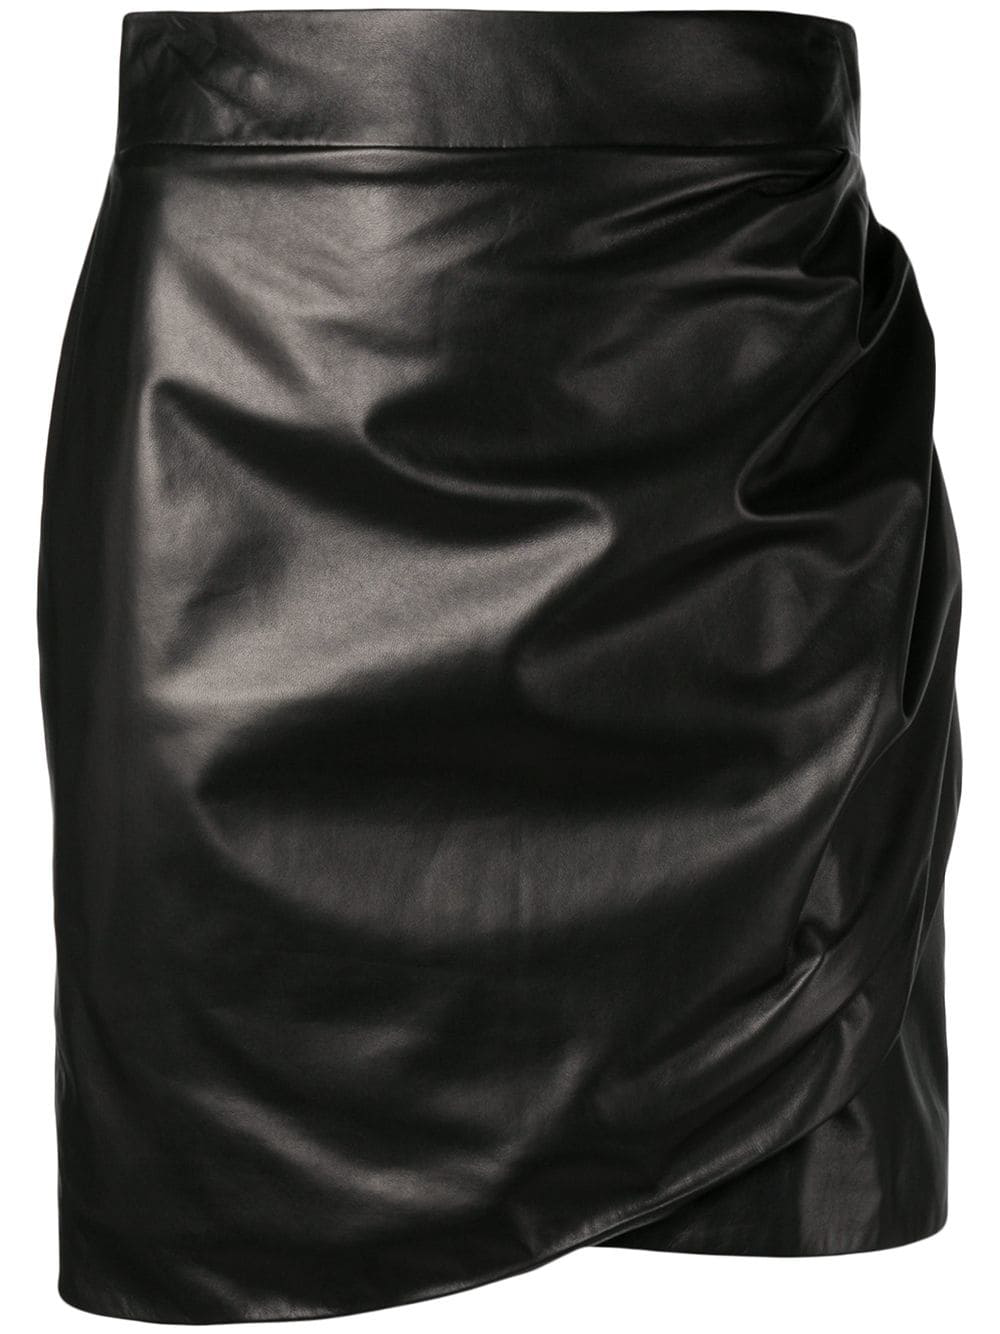 de0fe42752 Versace High Waisted Leather Wrap Skirt In Black | ModeSens